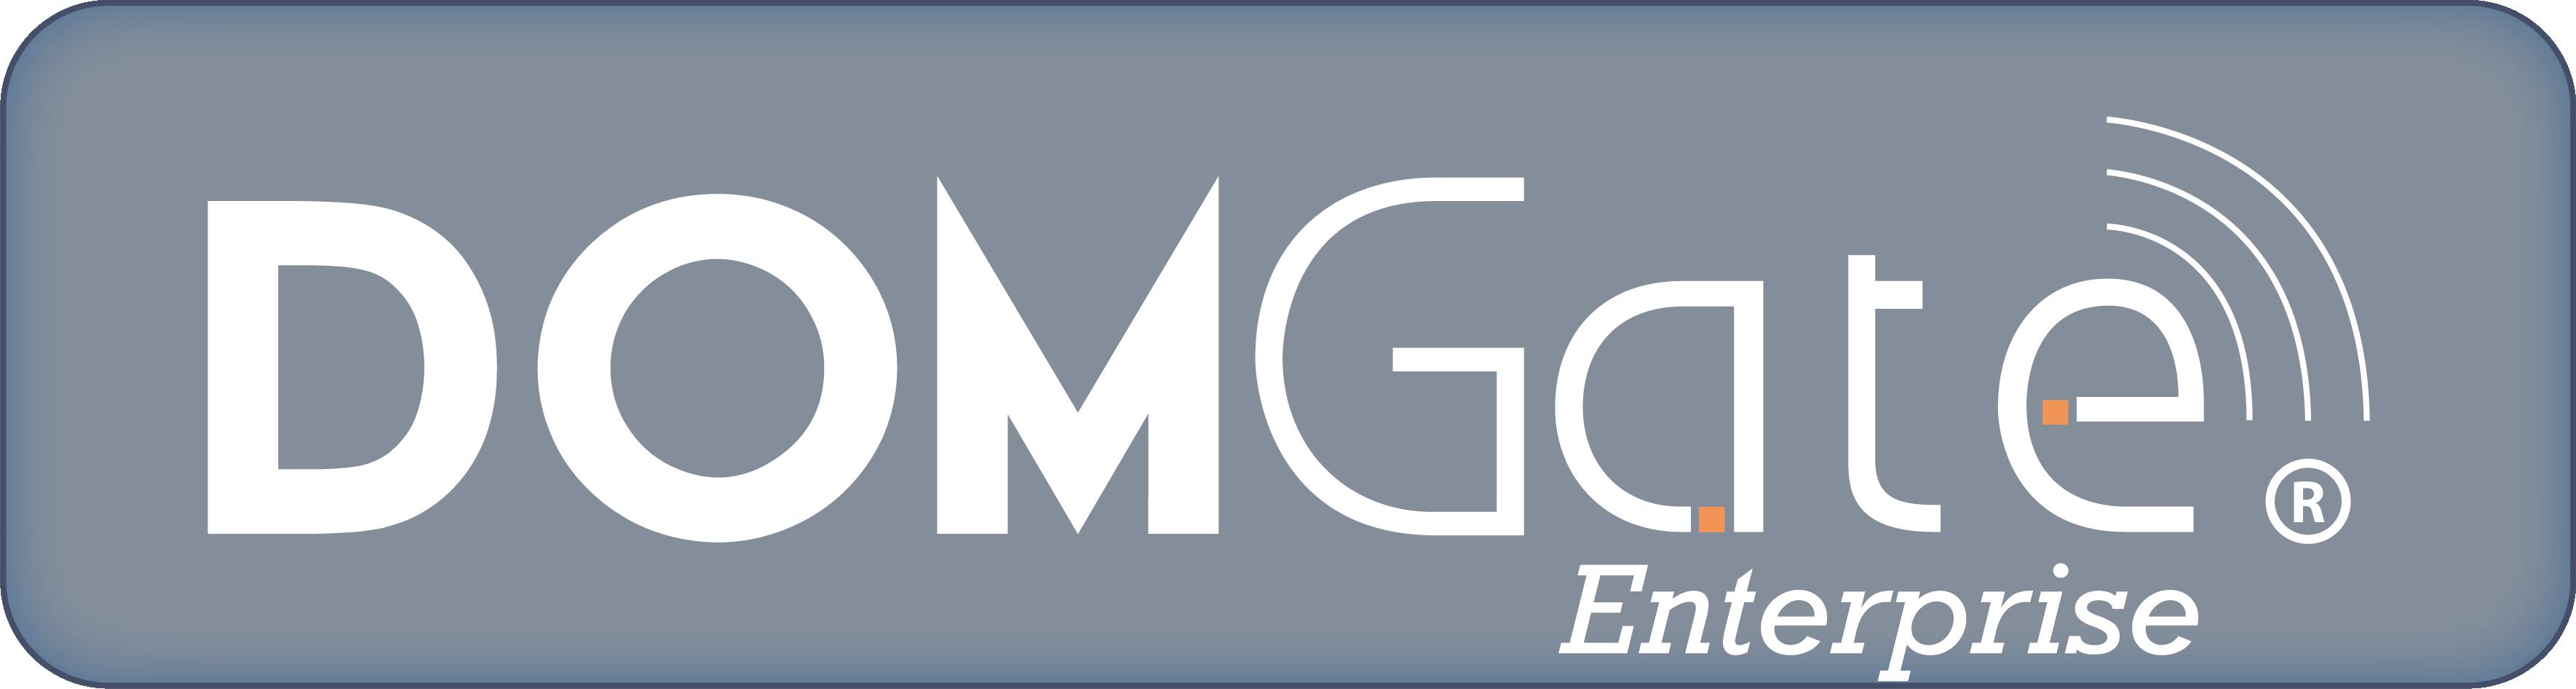 domotichotel-logo